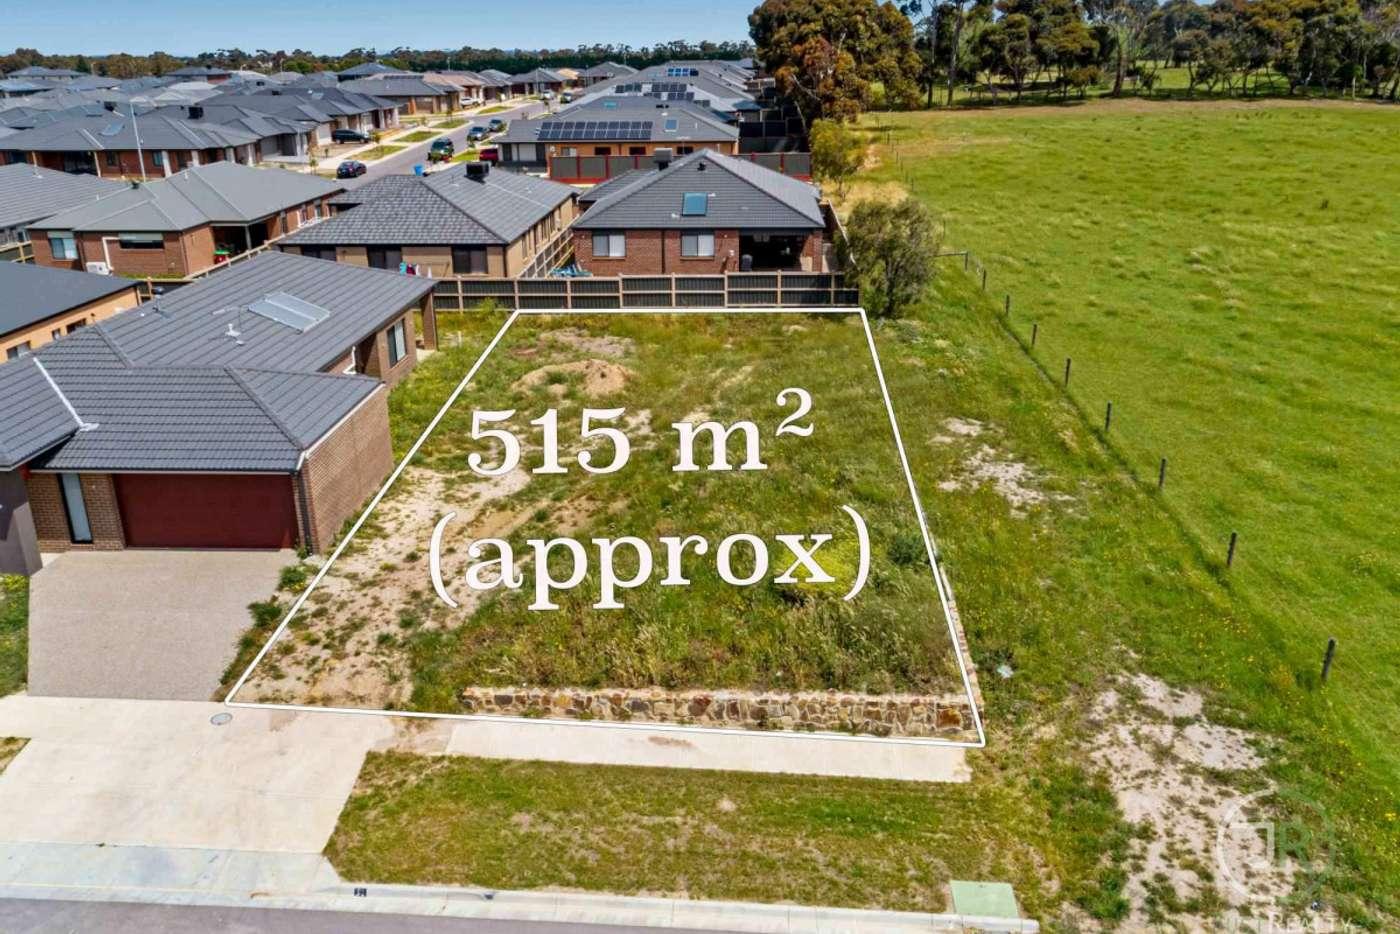 Main view of Homely residentialLand listing, 31 Bellthorpe Road, Botanic Ridge VIC 3977